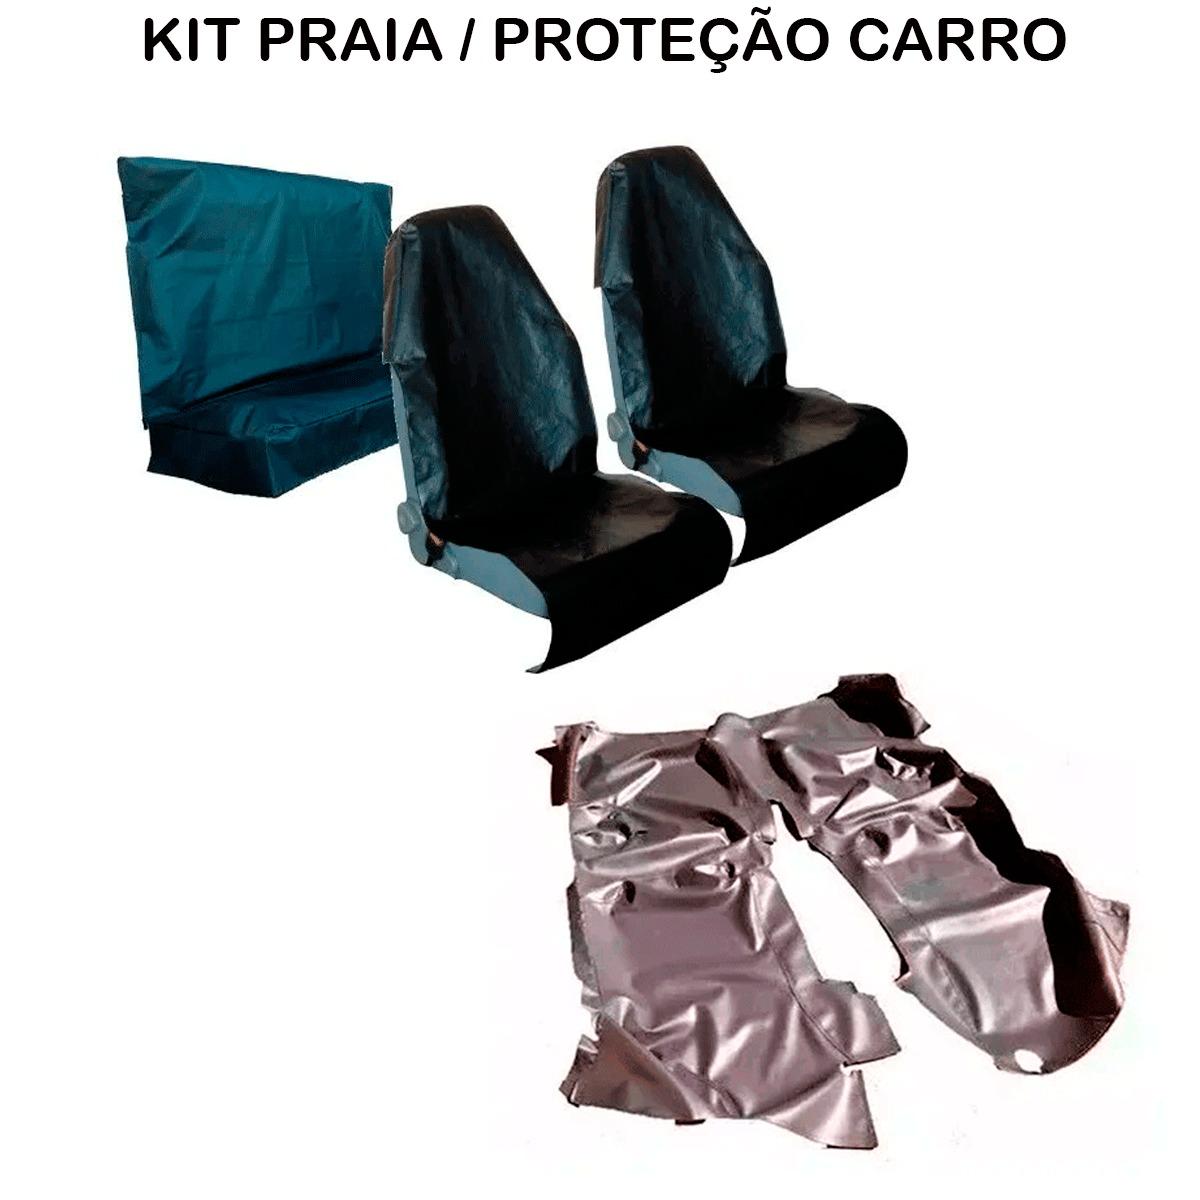 Tapete Em Vinil Volkswagen Spacefox Todos + Capa Banco Protecao Banco Areia Suor Academia